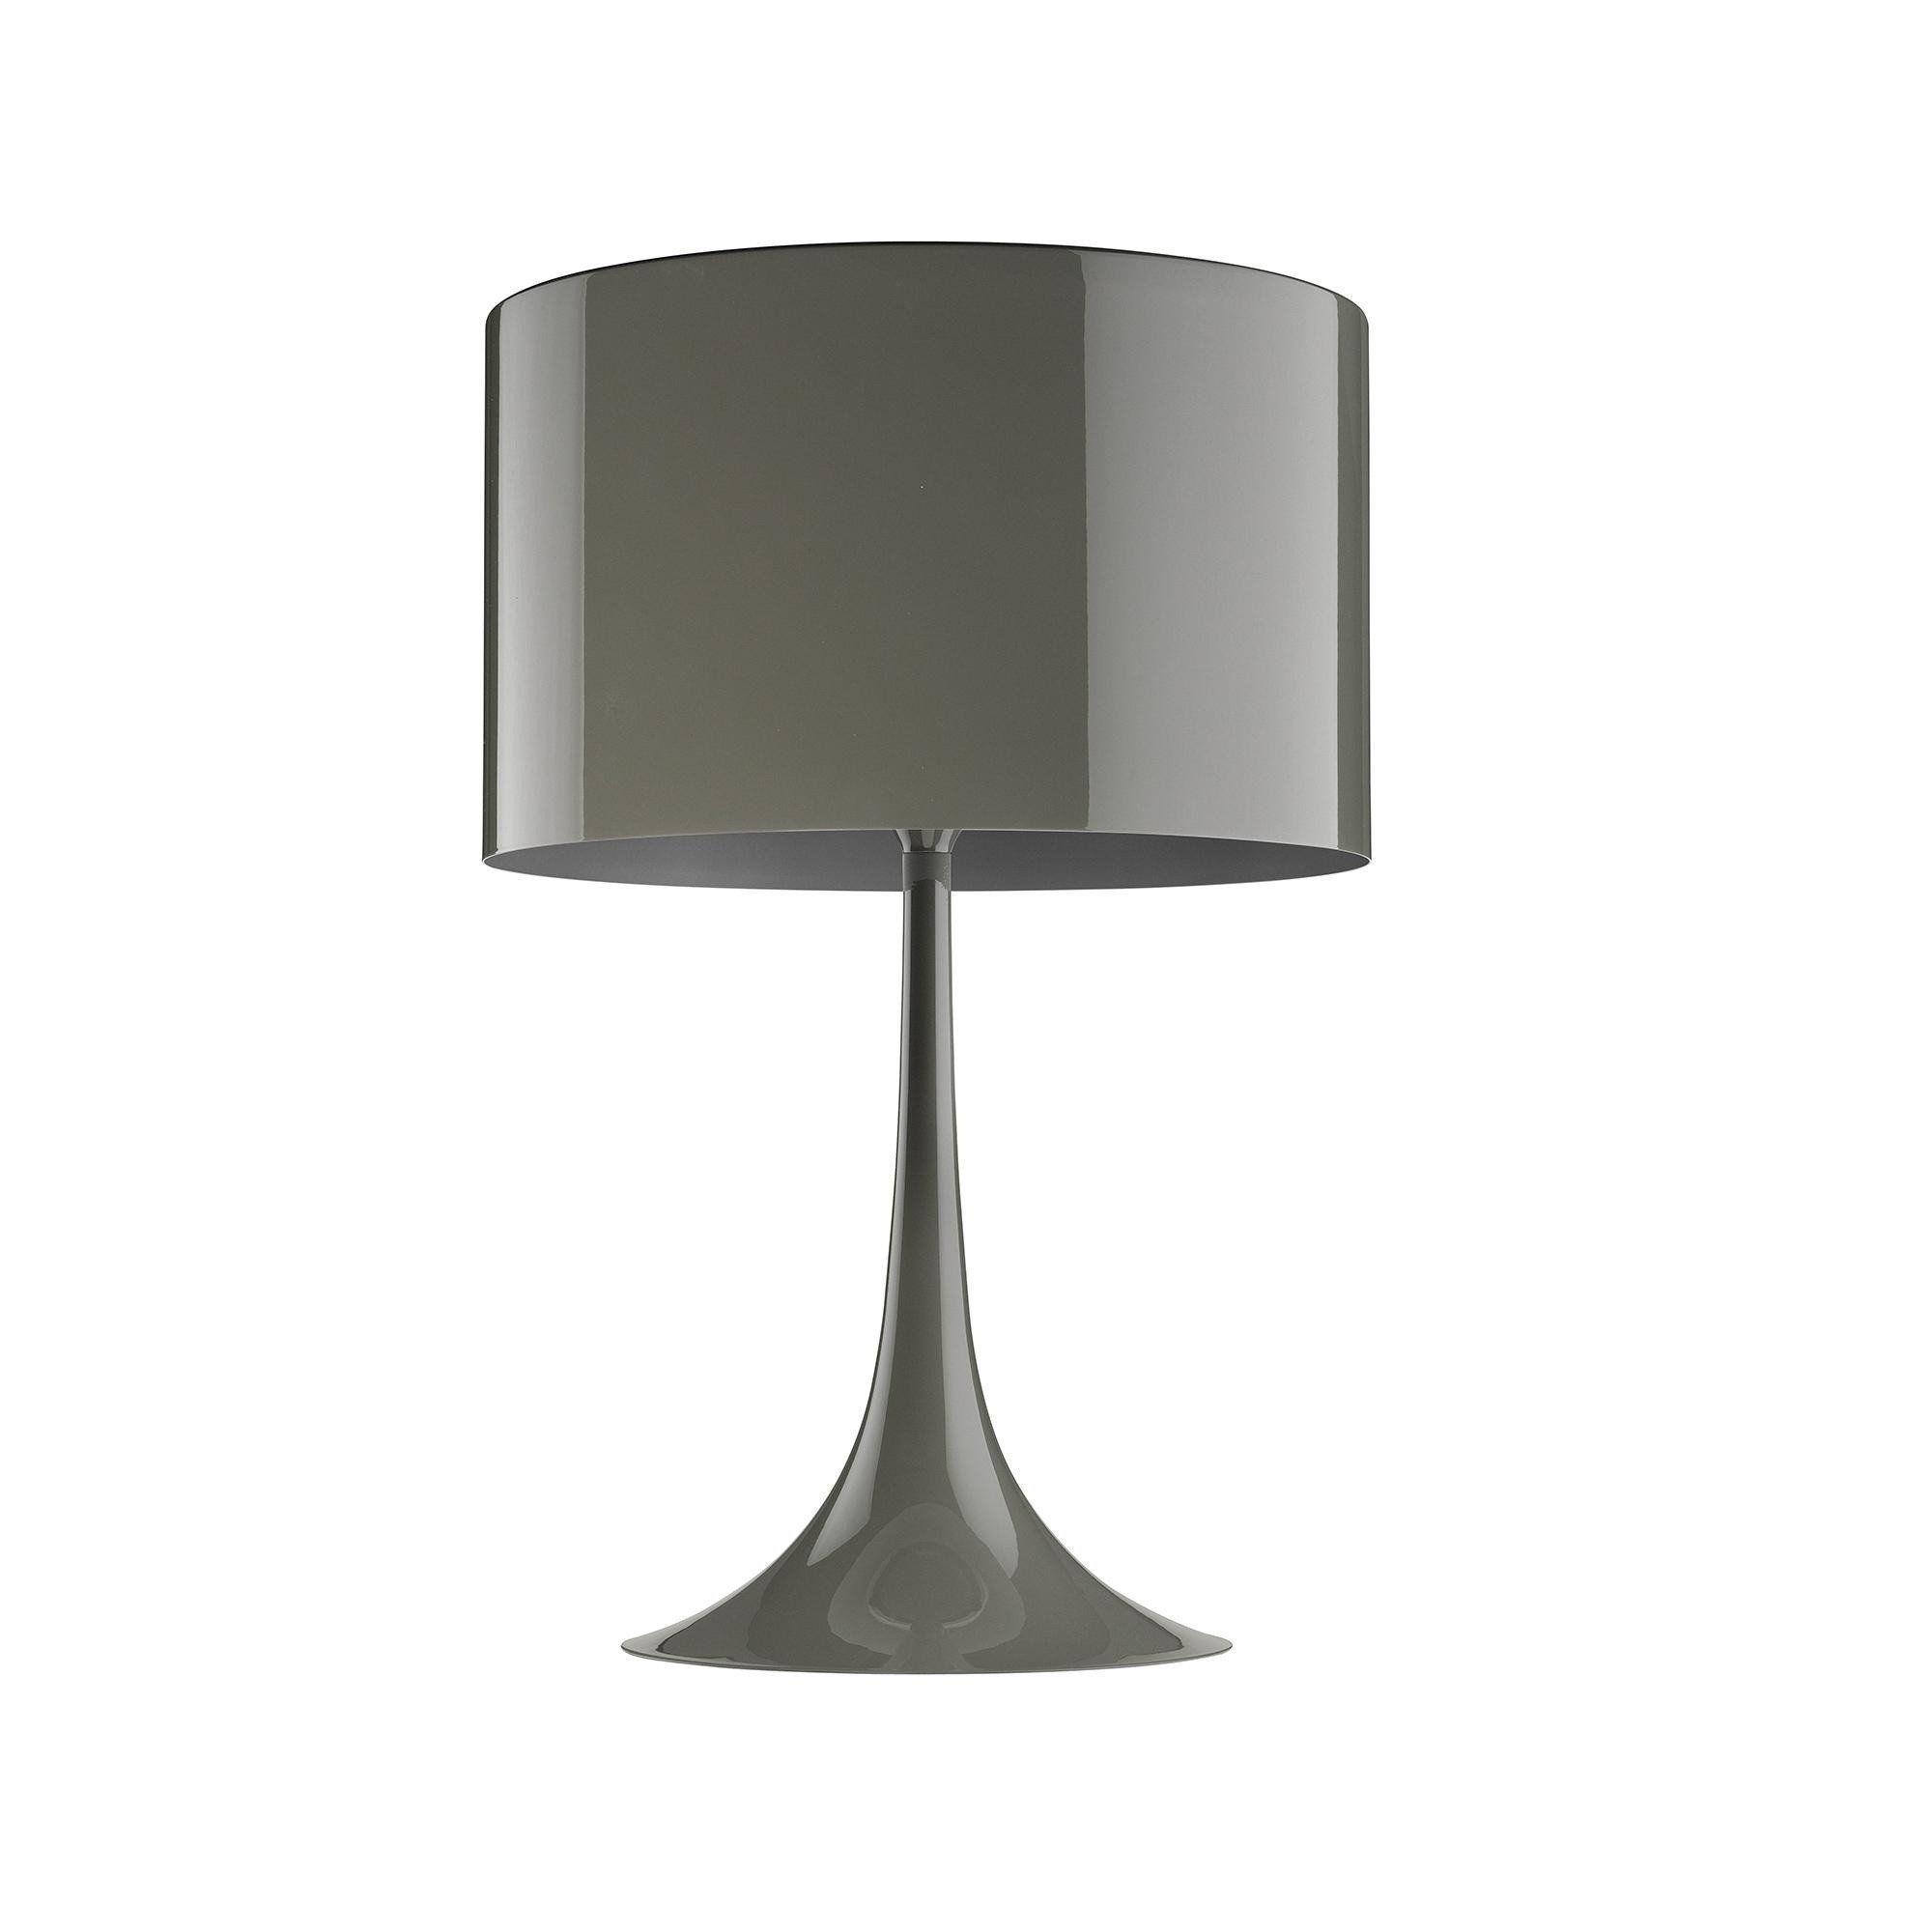 ... Flos   Spun Light T2 Table Lamp   Mud/glossy ...